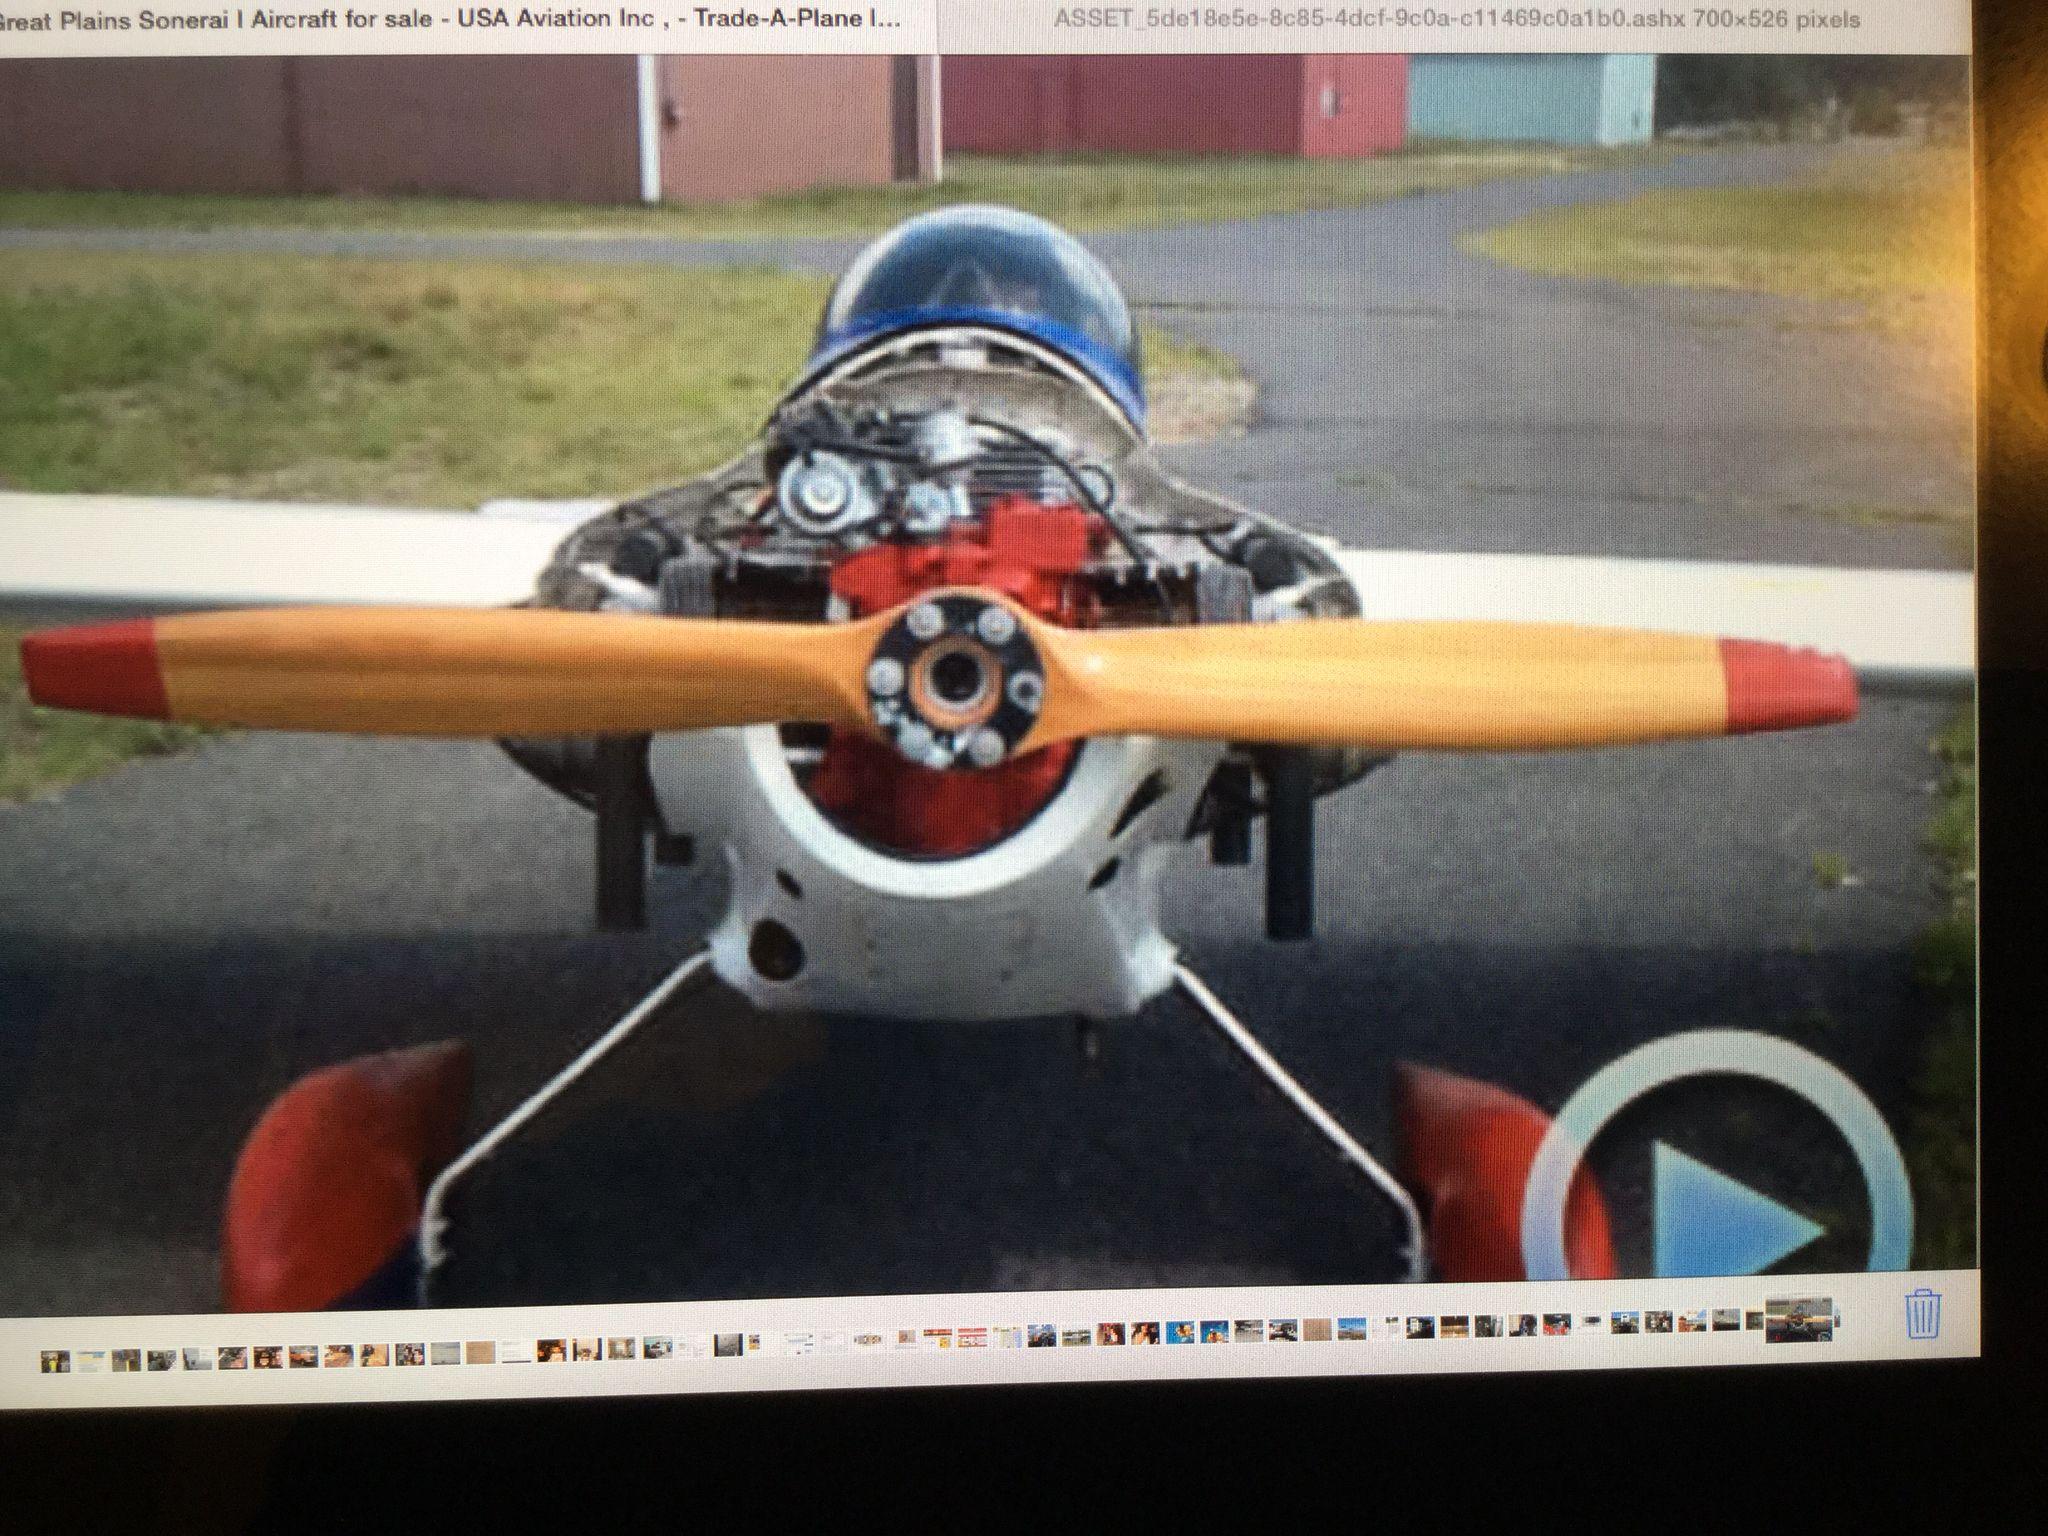 Sonerai I VW Engine 1 6 dual ignition | Cessna 188 B- AG | Vw engine